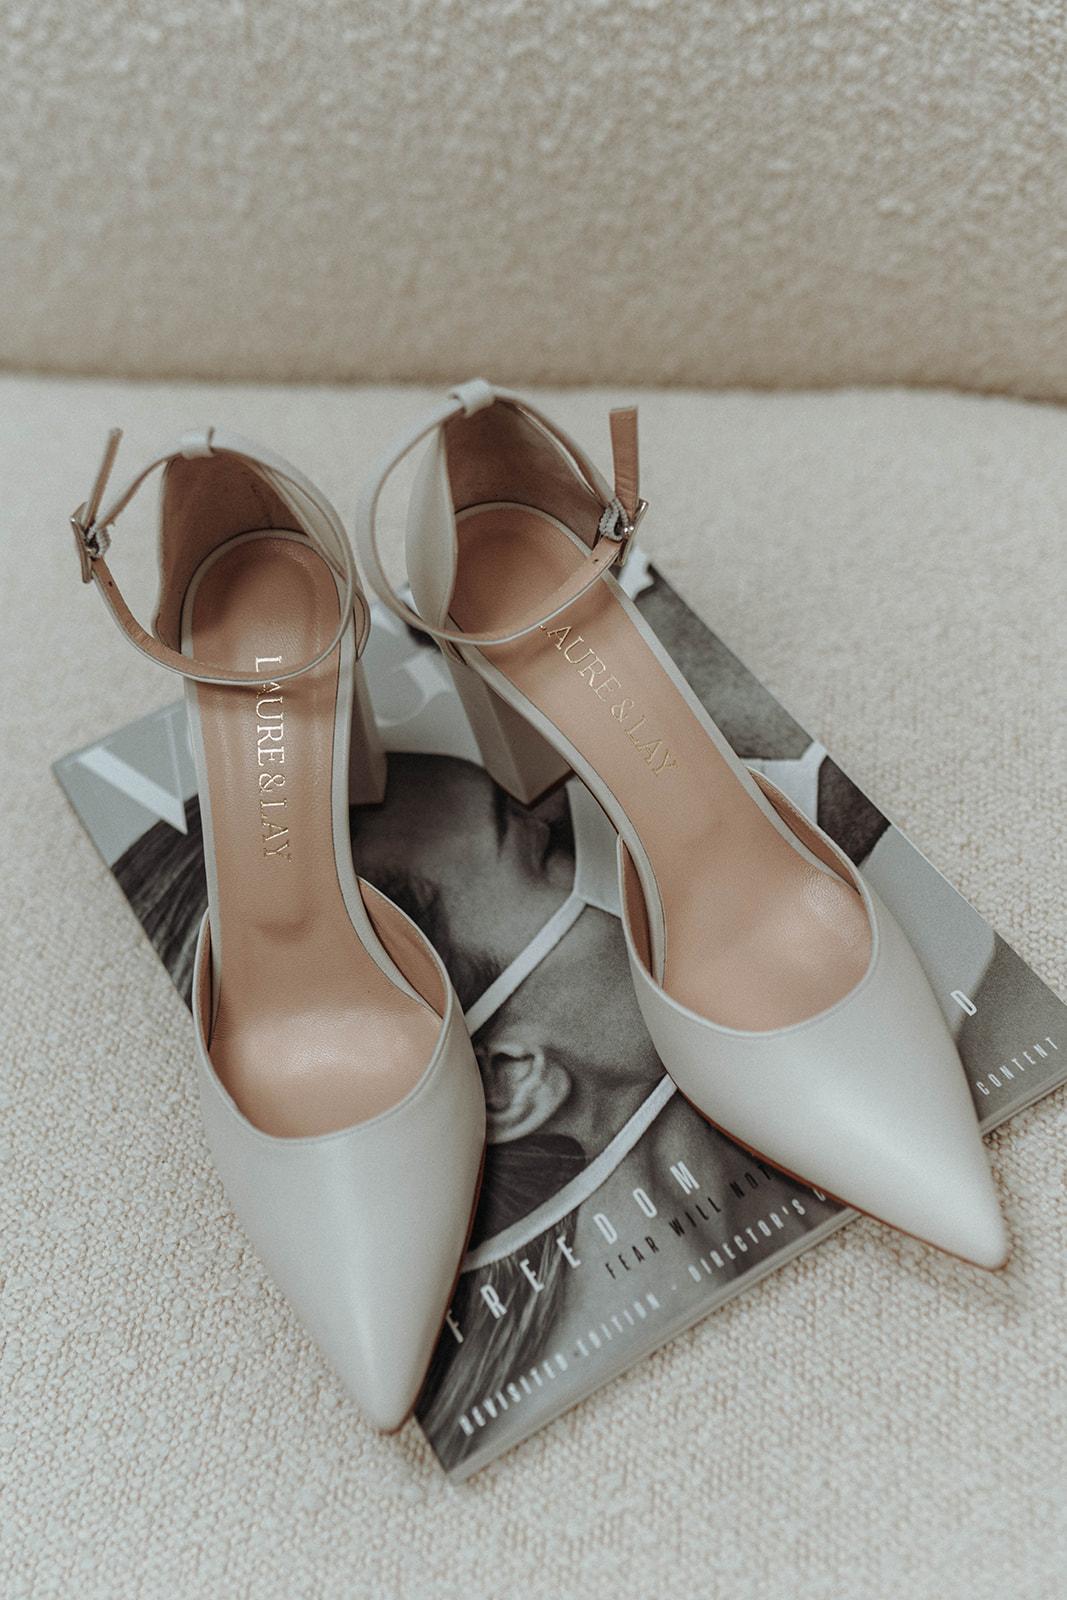 Brautschuh Nala & Lay White Concepts Brautmode Aachen